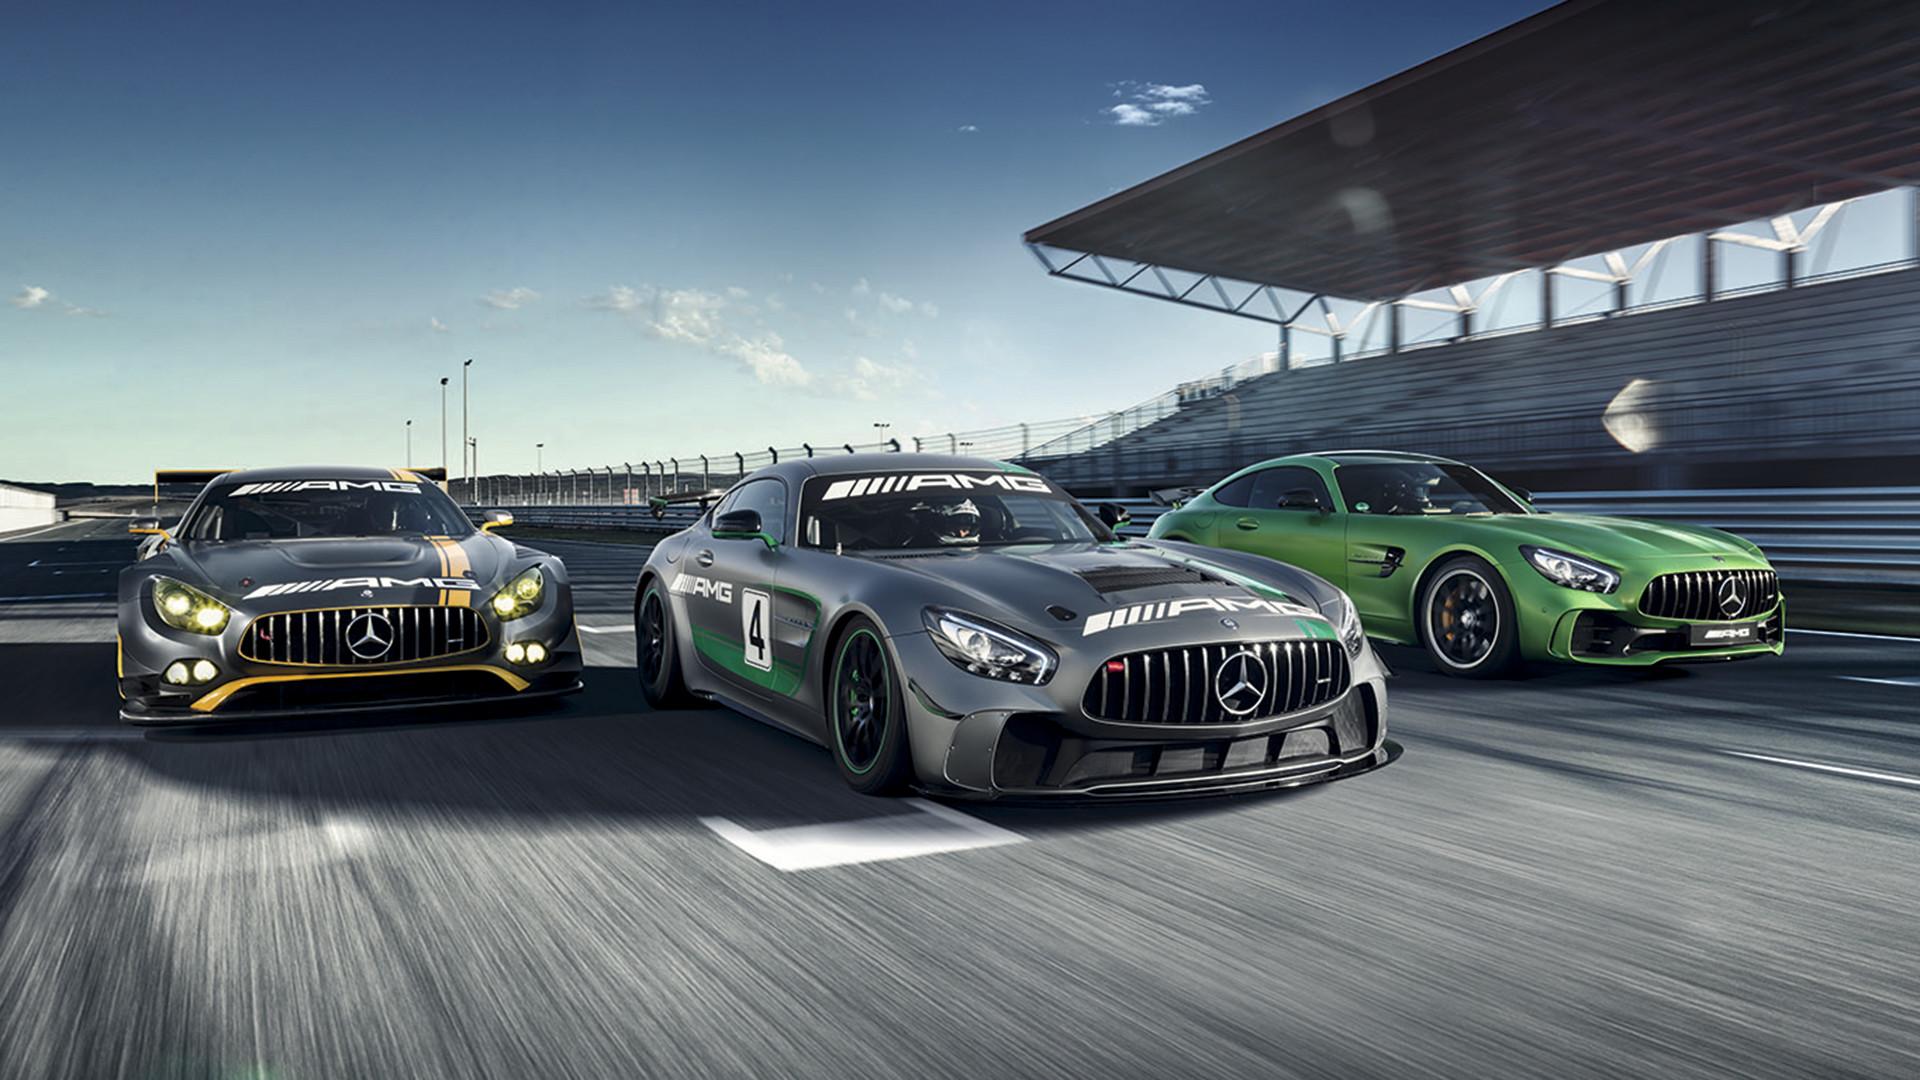 AMG Motorsports